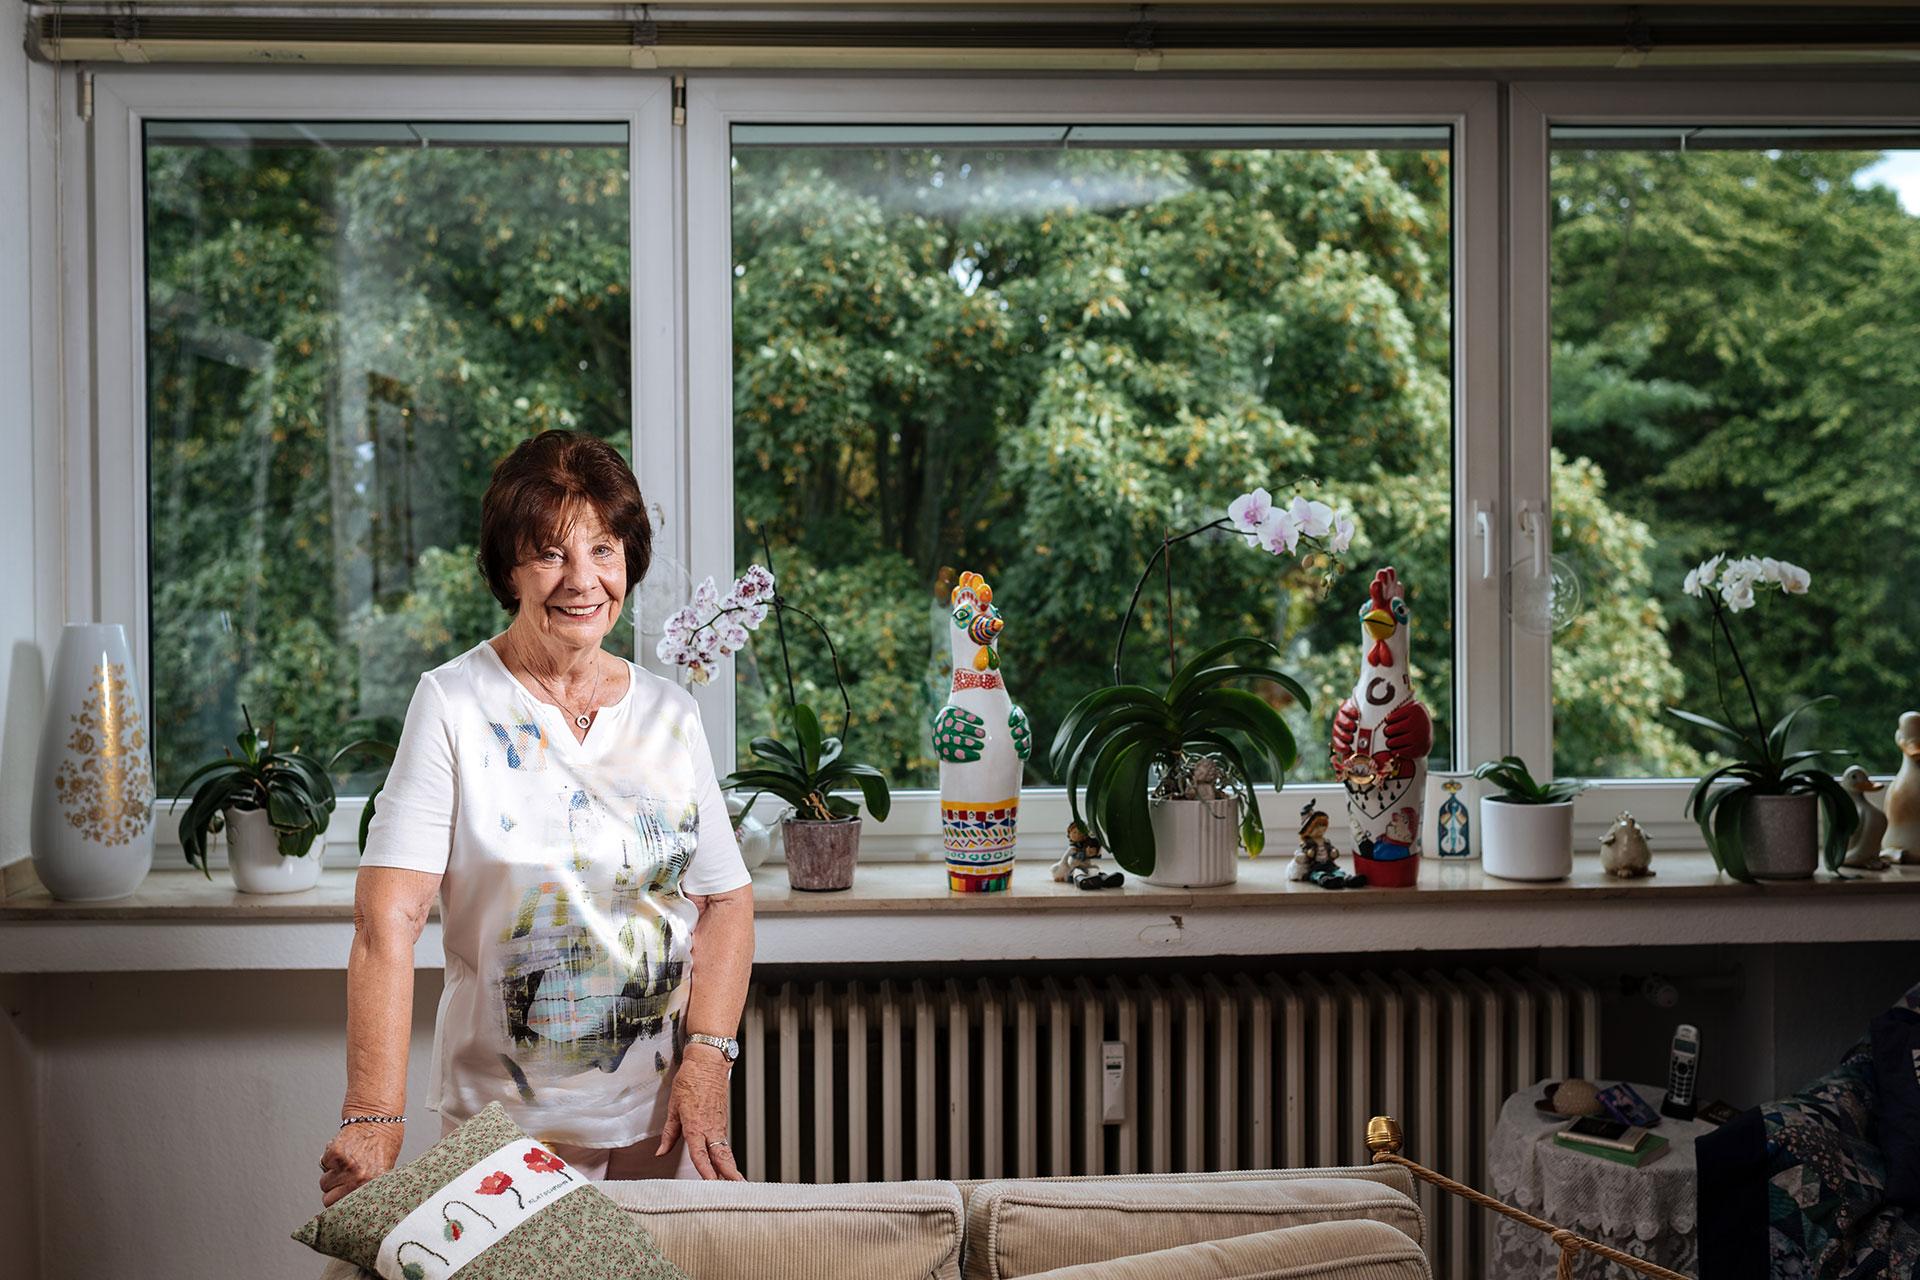 Katharina Petzholdt Köln Beste Menschen Kölsch Dozentin Kölner Wochenspiegel GAG Immobilien AG Zollstock Kölsch Akademie